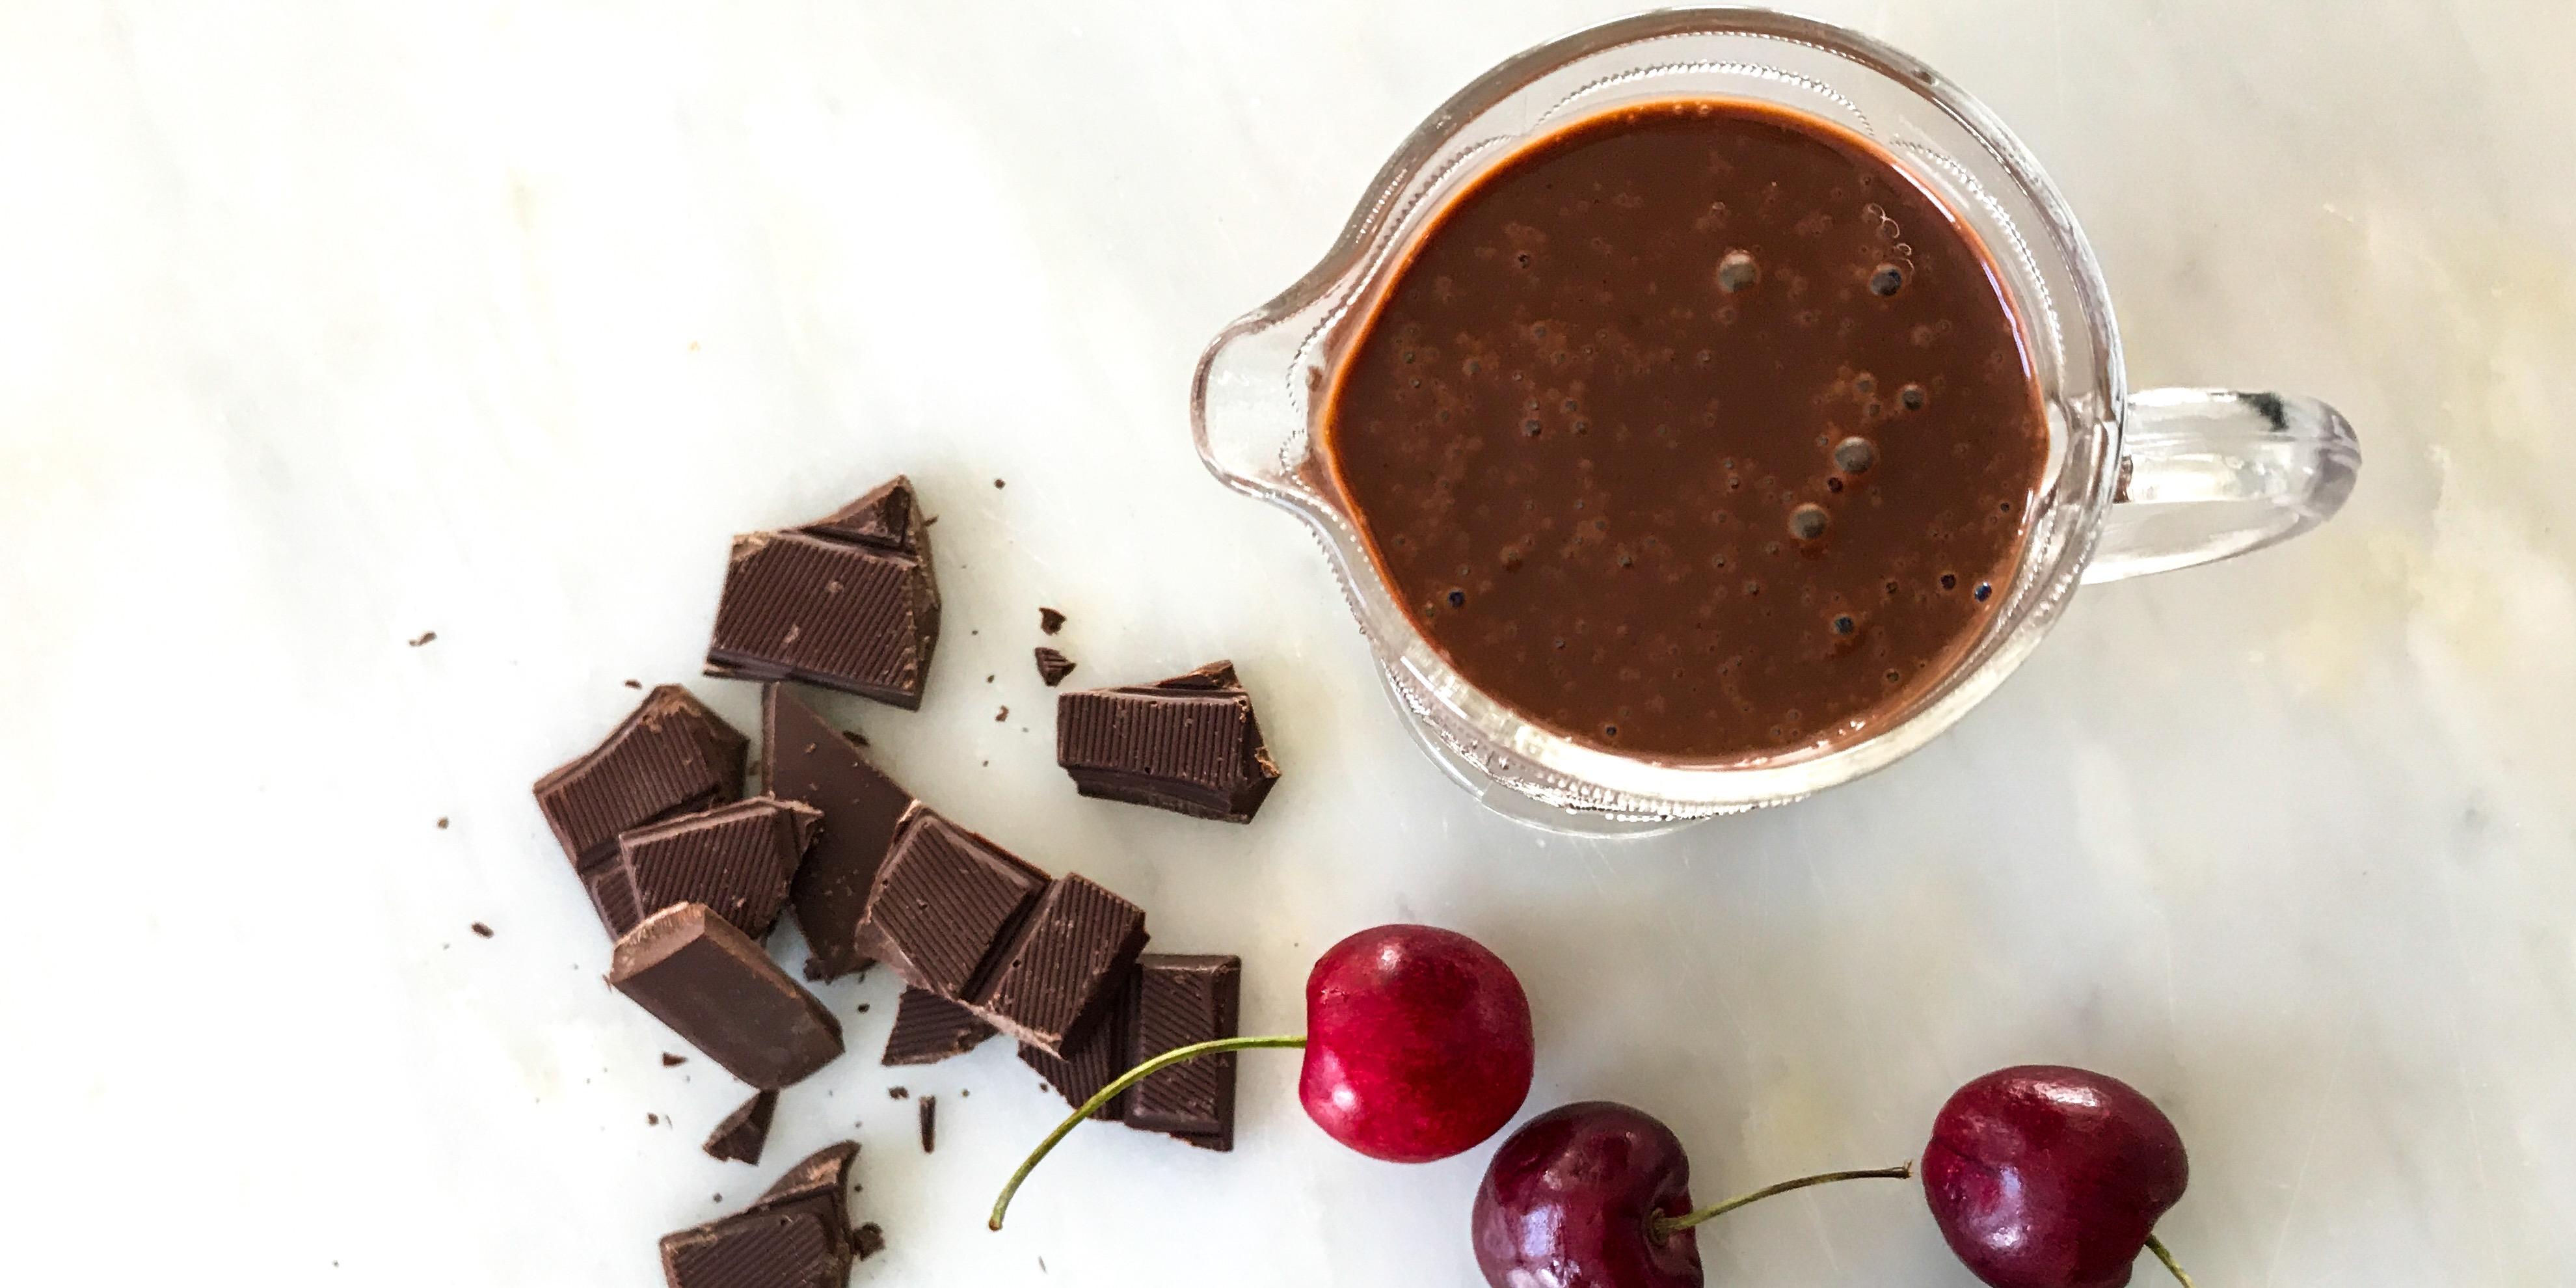 chokladsås med blockchoklad